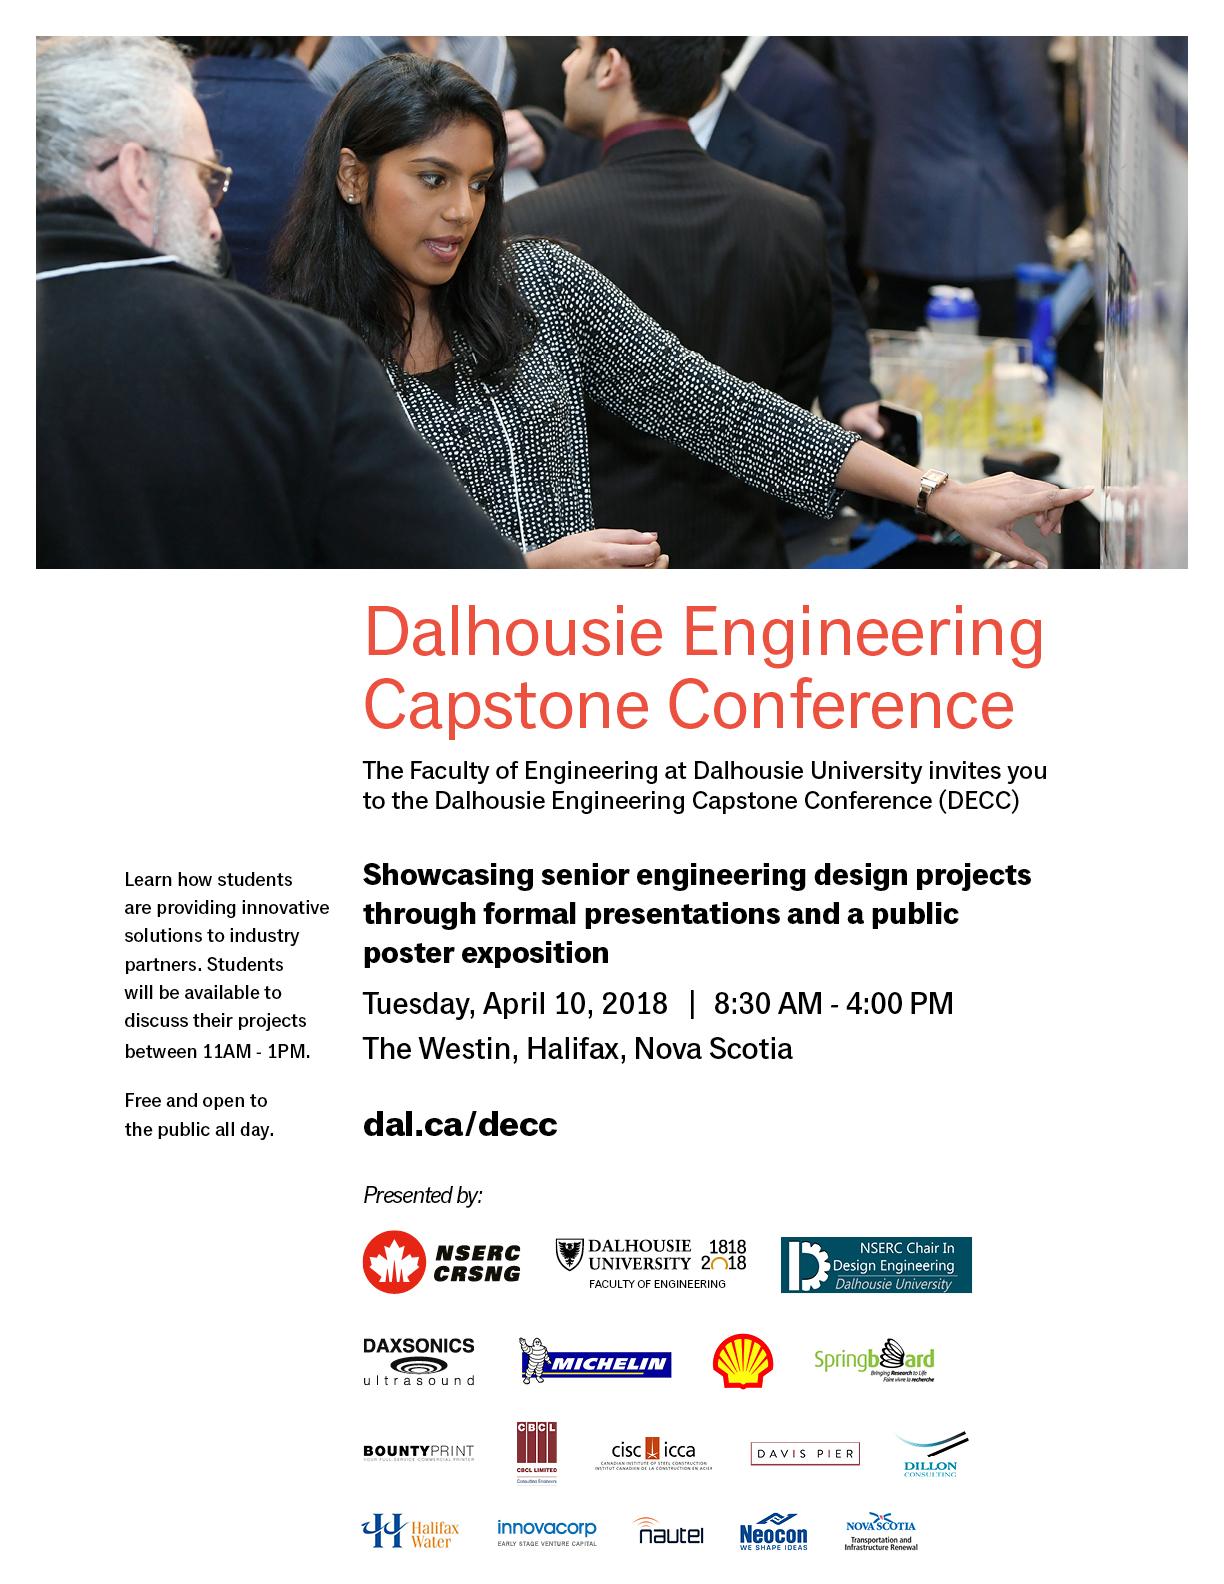 23682 Capstone Engineering Poster_8.5x11_Online.jpg